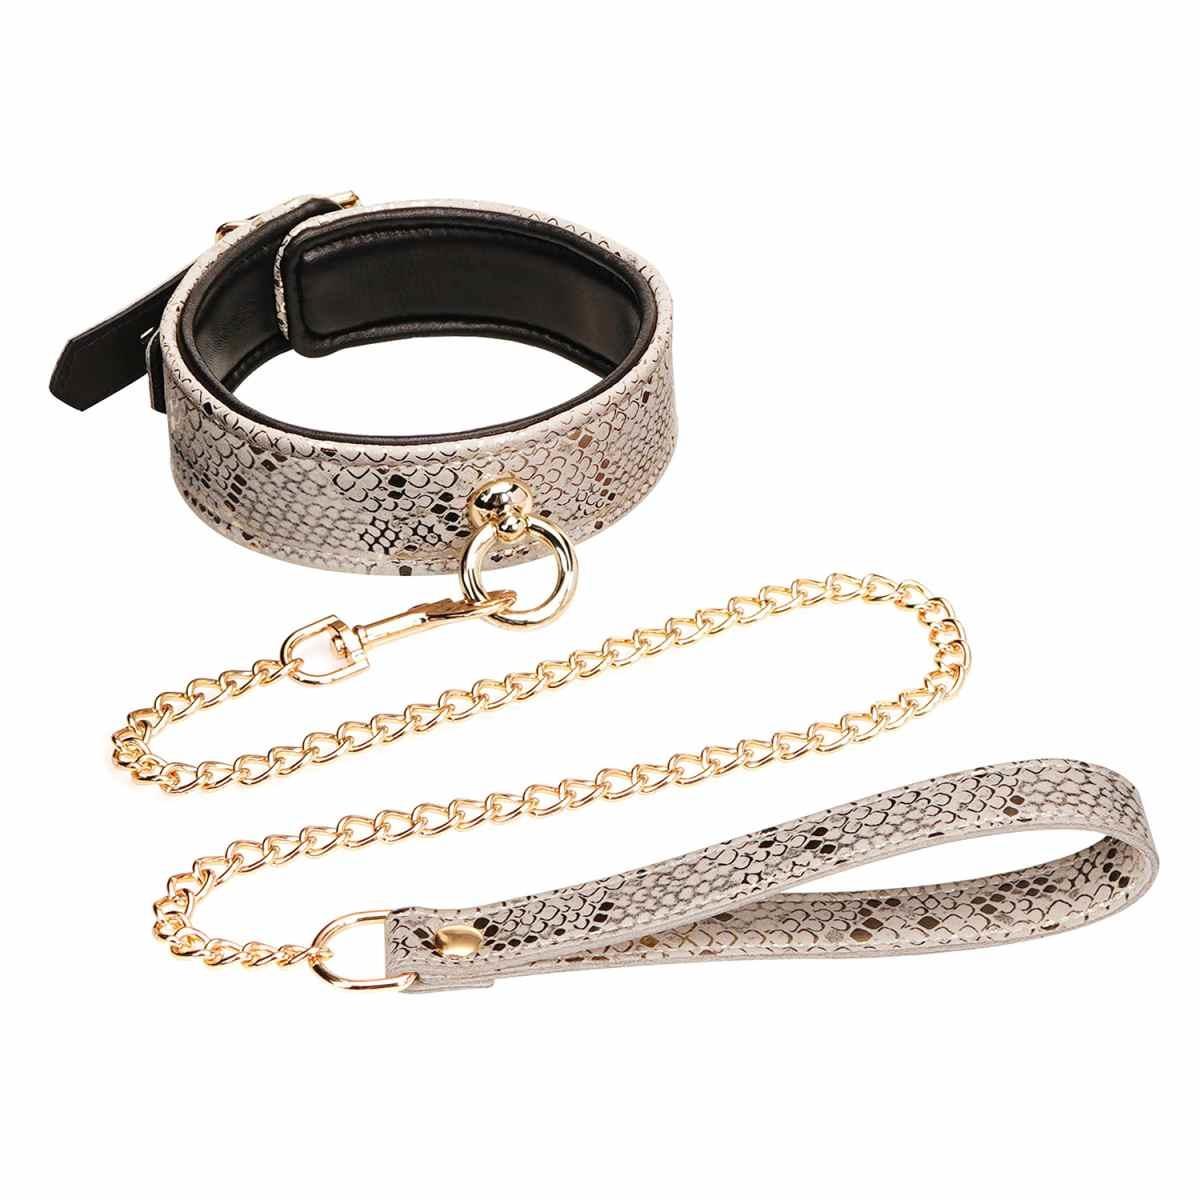 Microfiber Snake Collar and Leash